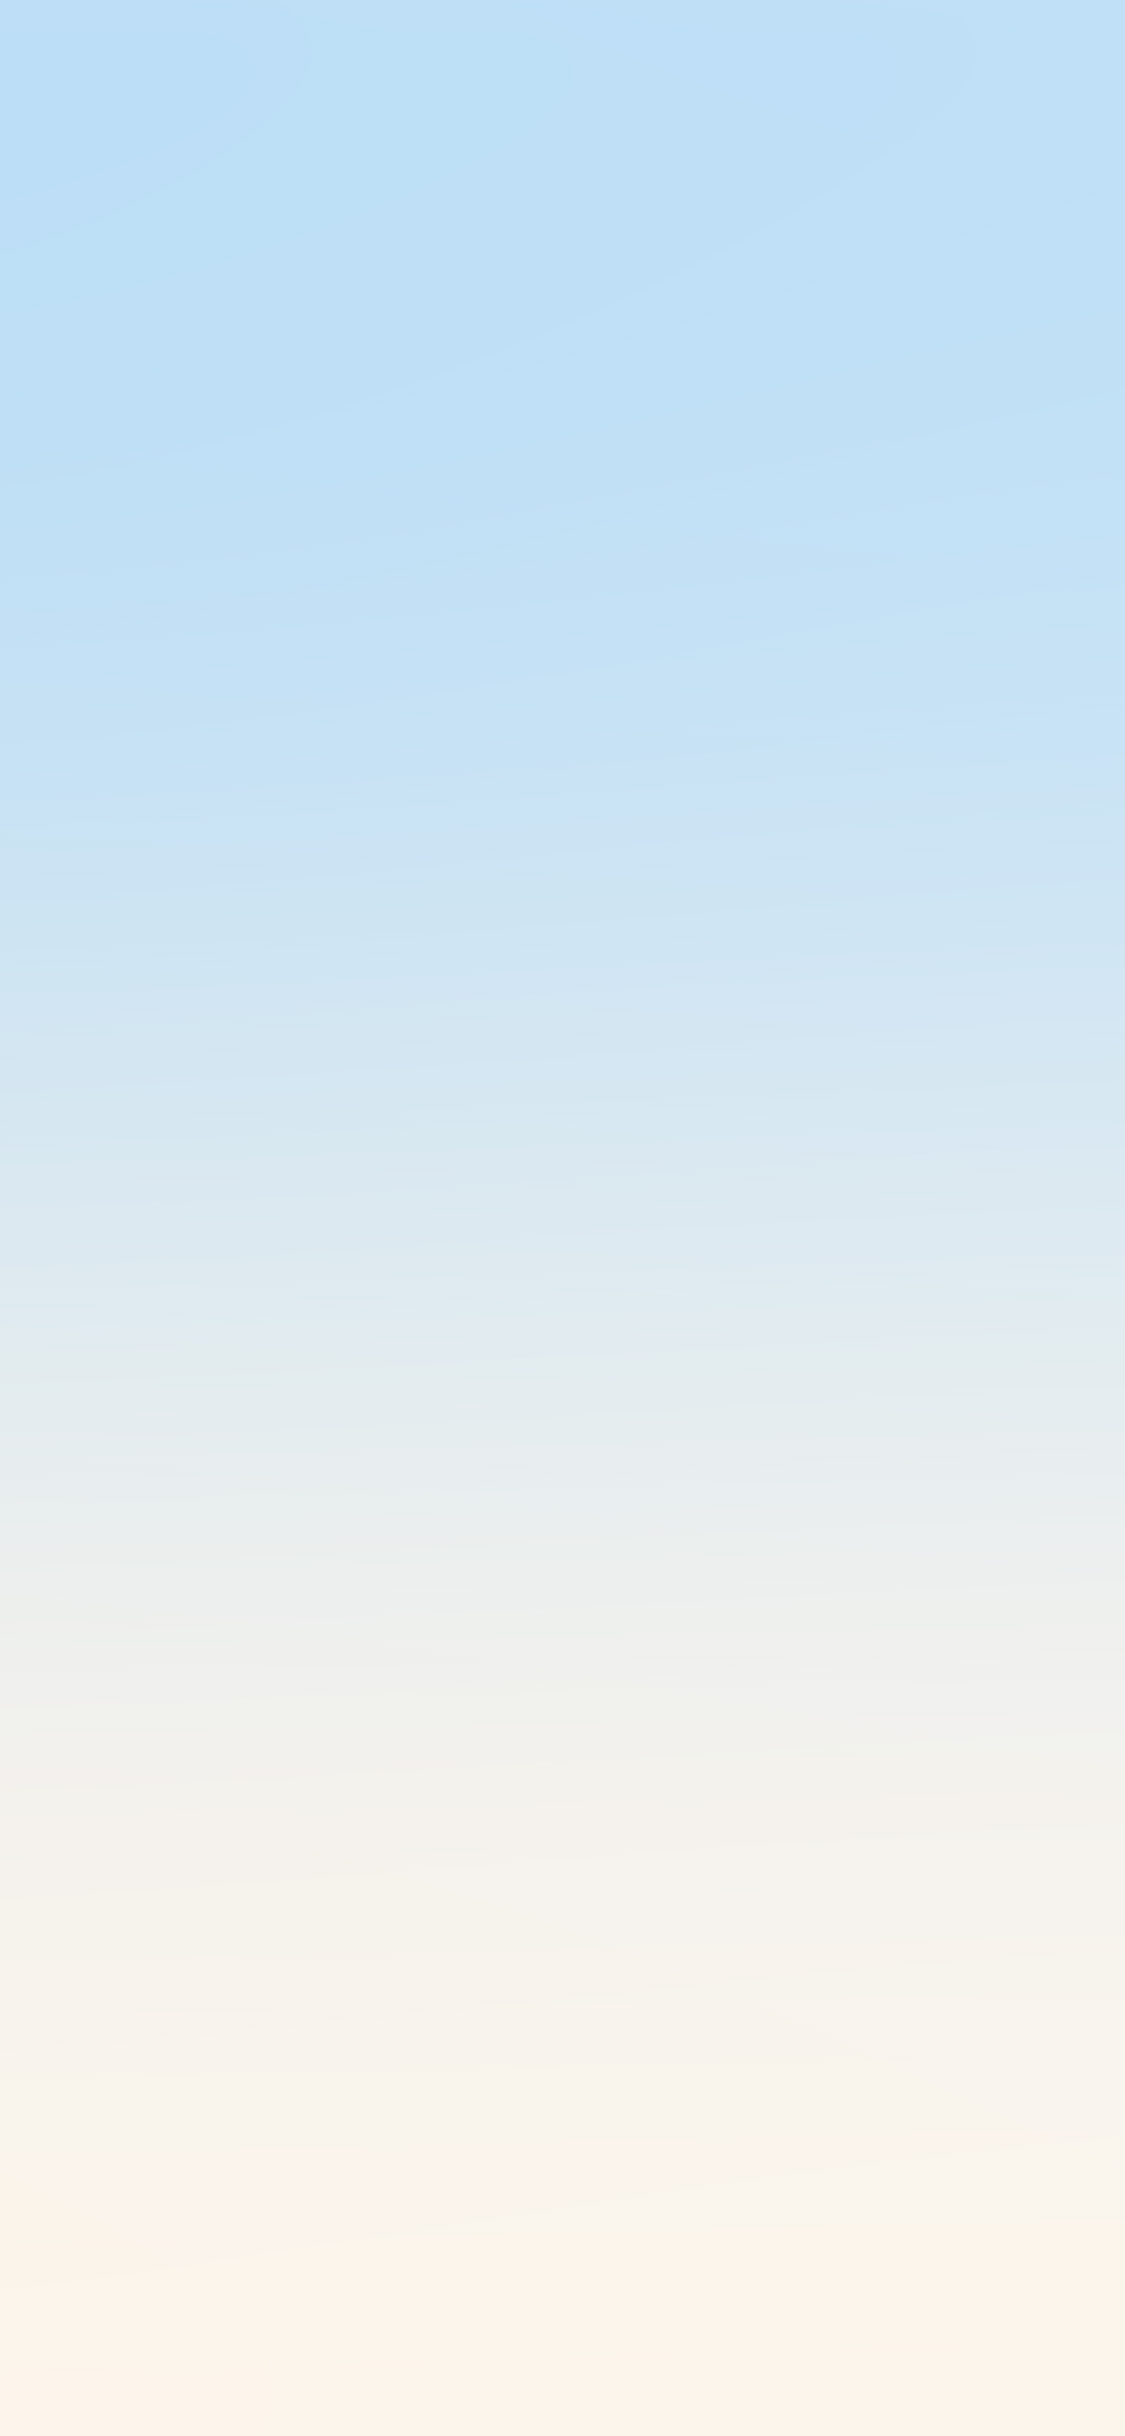 iPhonexpapers.com-Apple-iPhone-wallpaper-sl96-soft-blue-pastel-blur-gradation